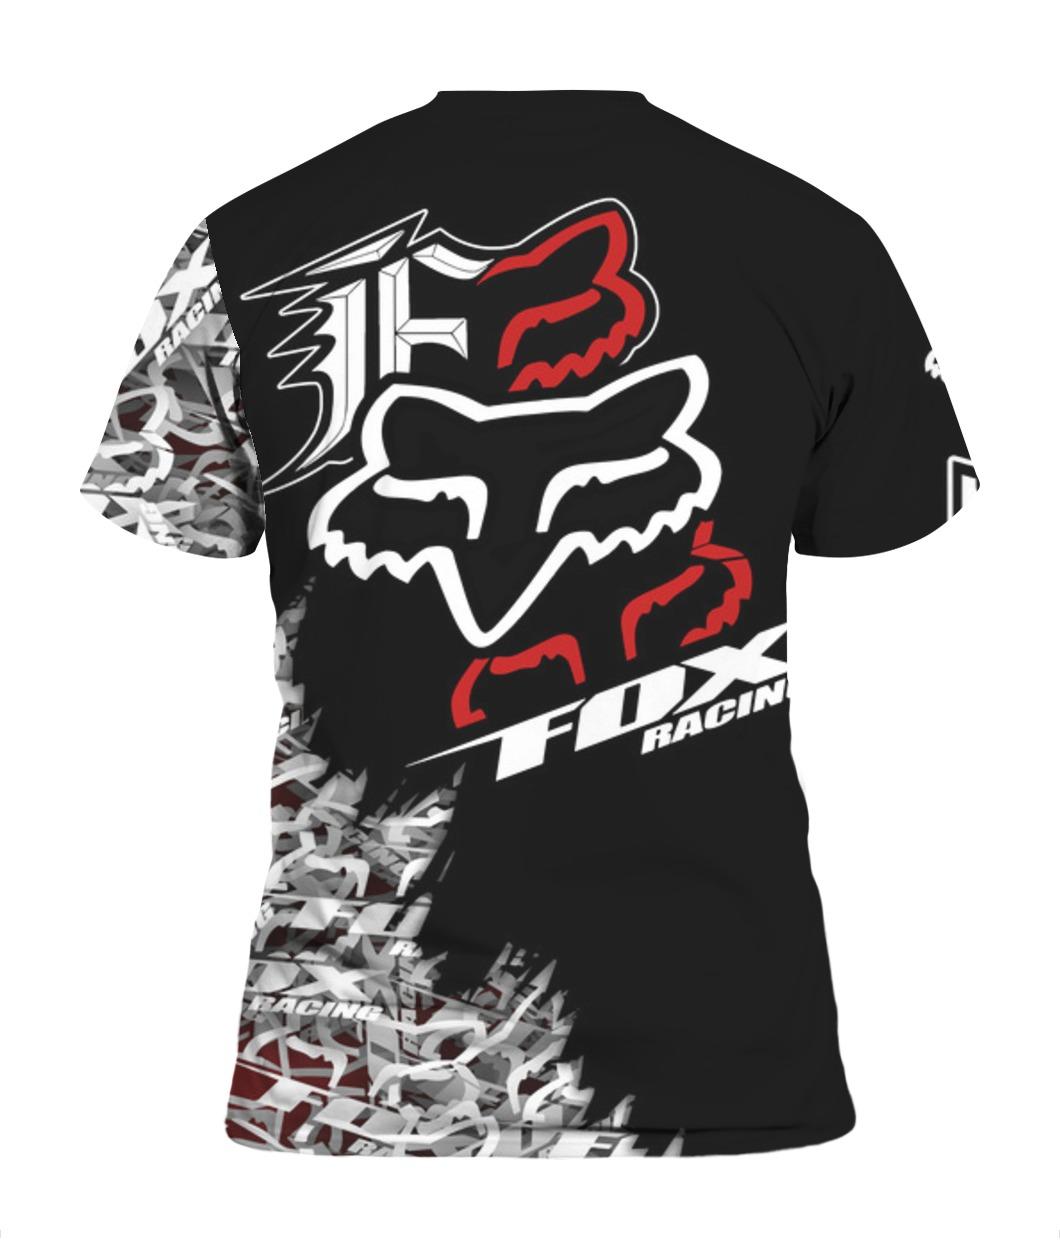 Fox racing full printing tshirt - back